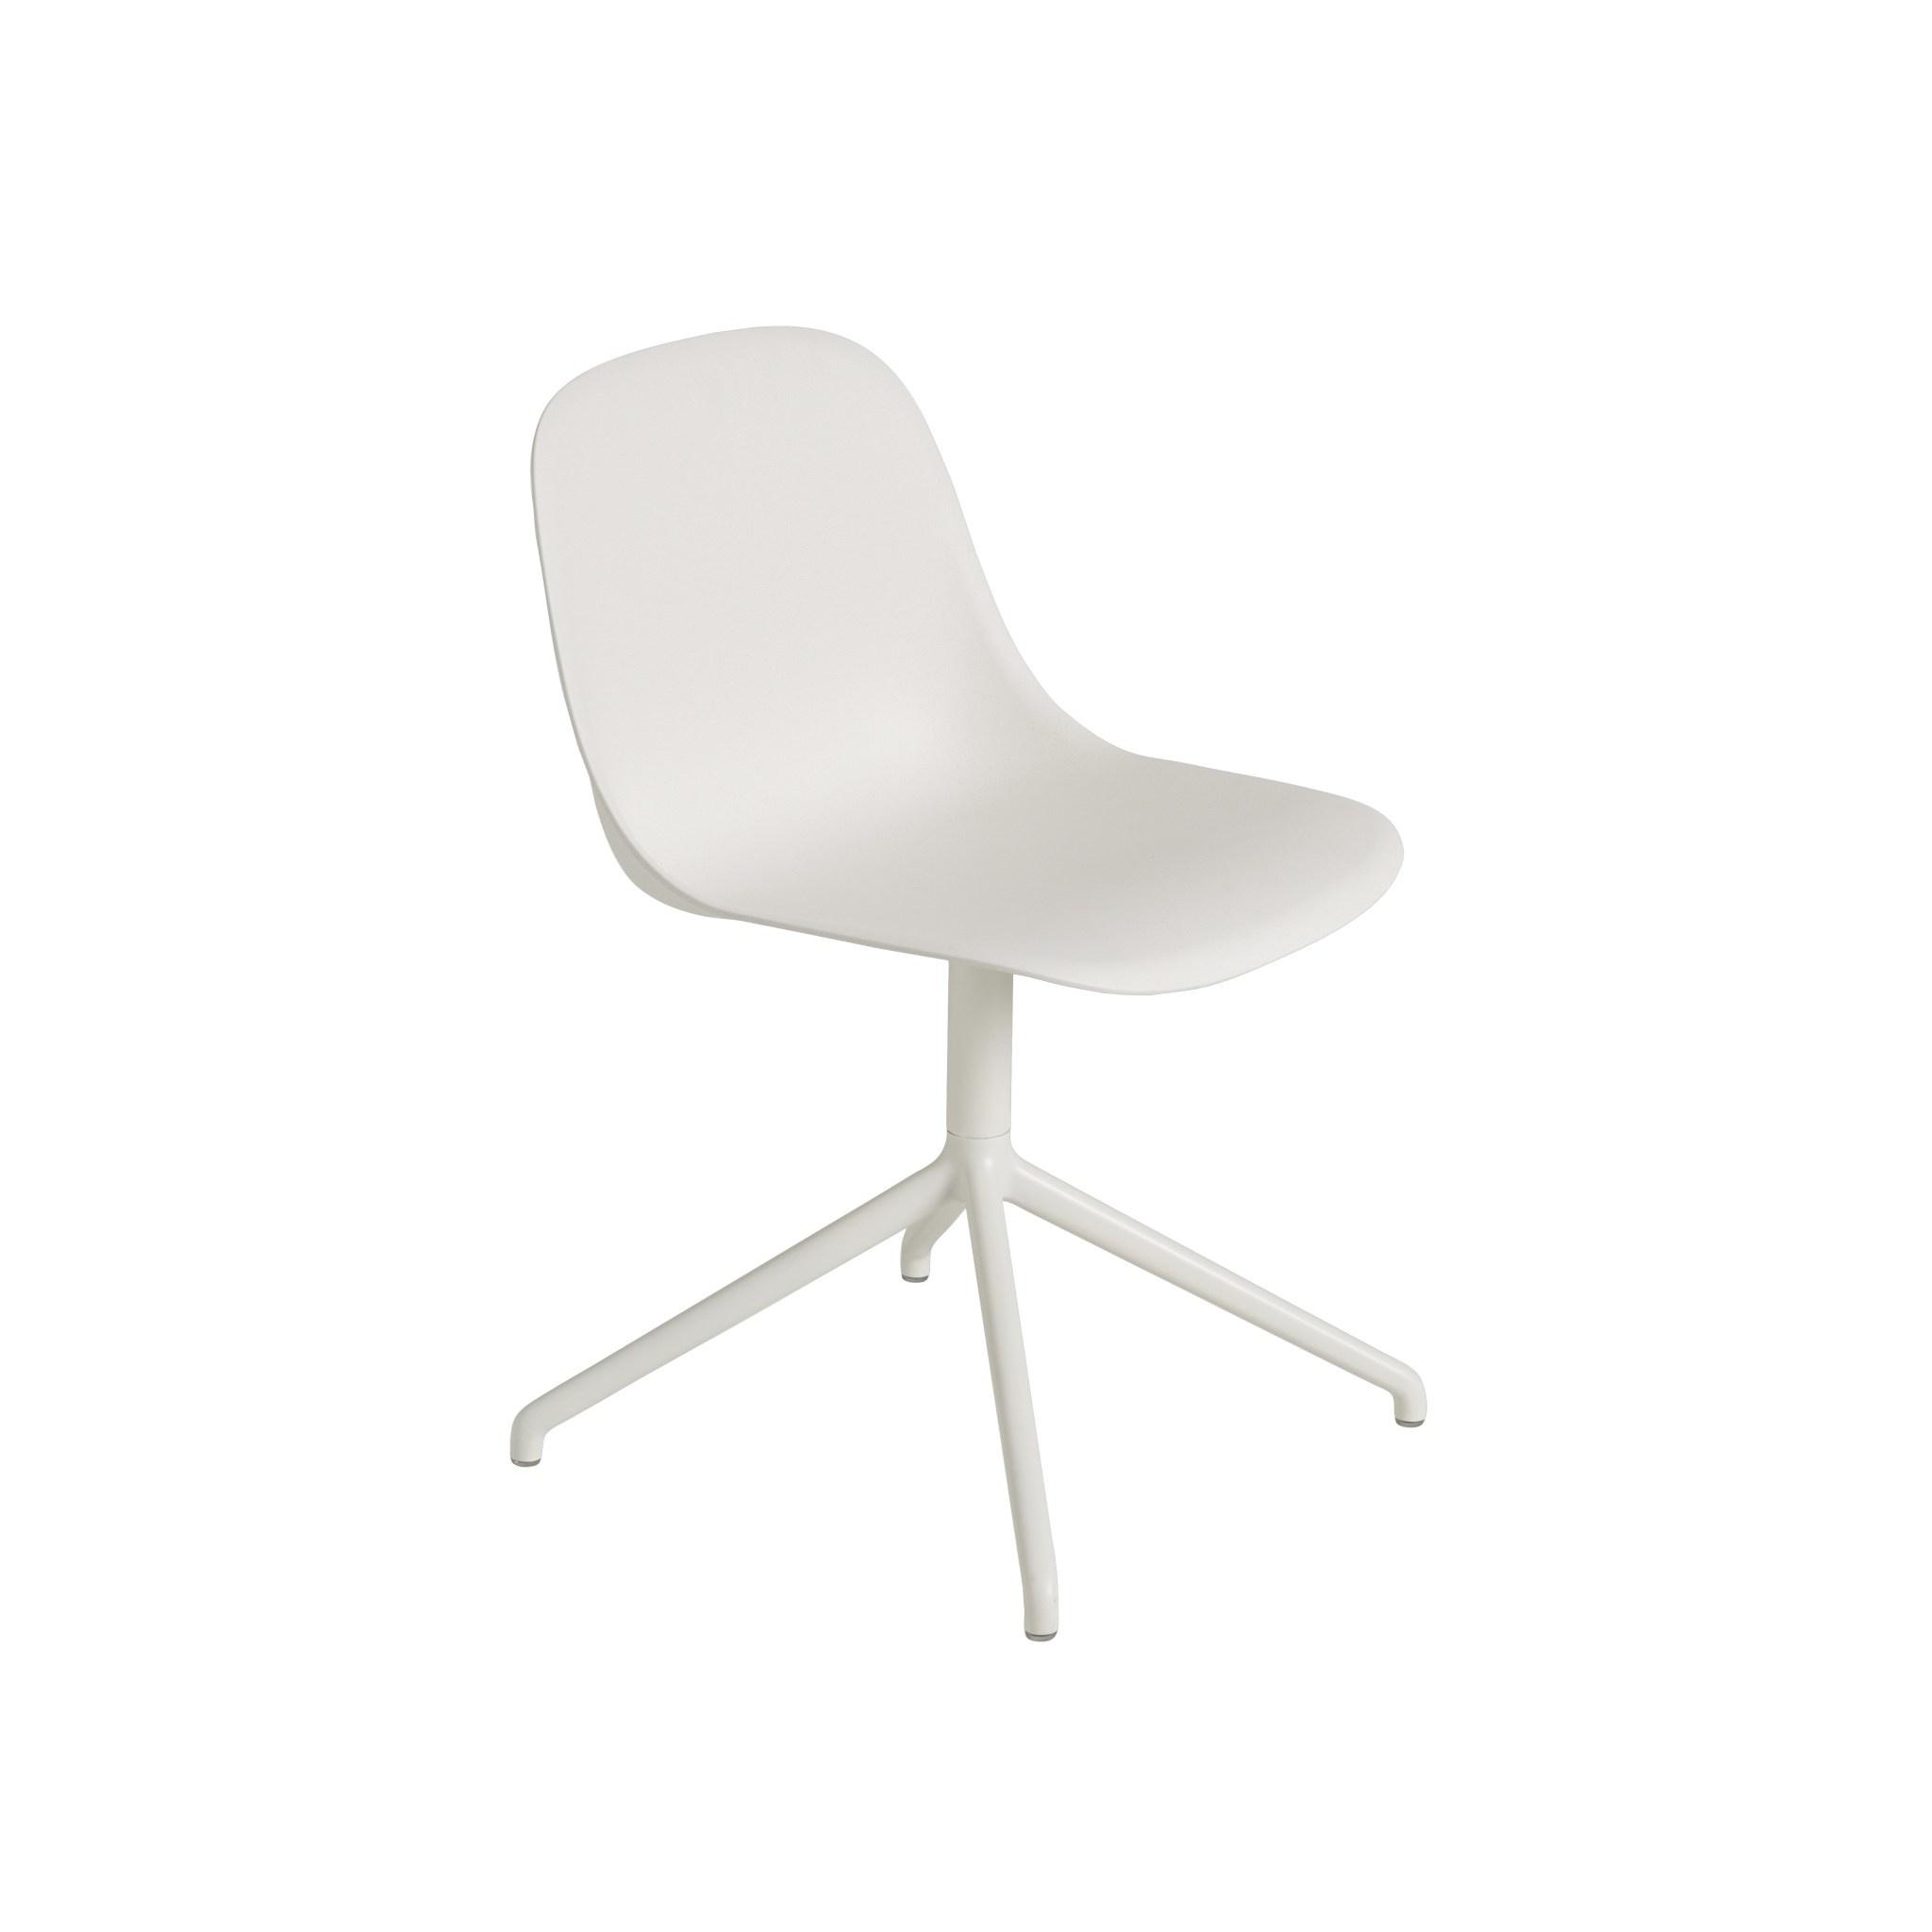 Fiber side chair swivel base w.o. return-6